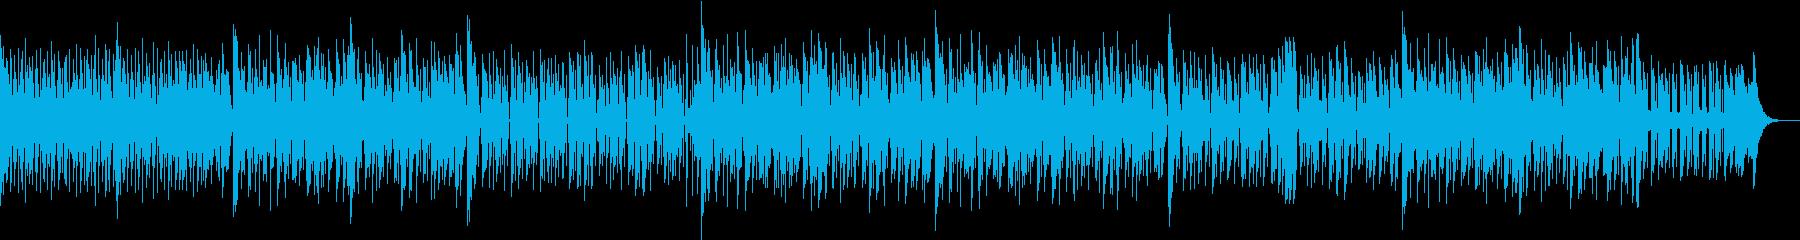 DJダンスミュージックの再生済みの波形